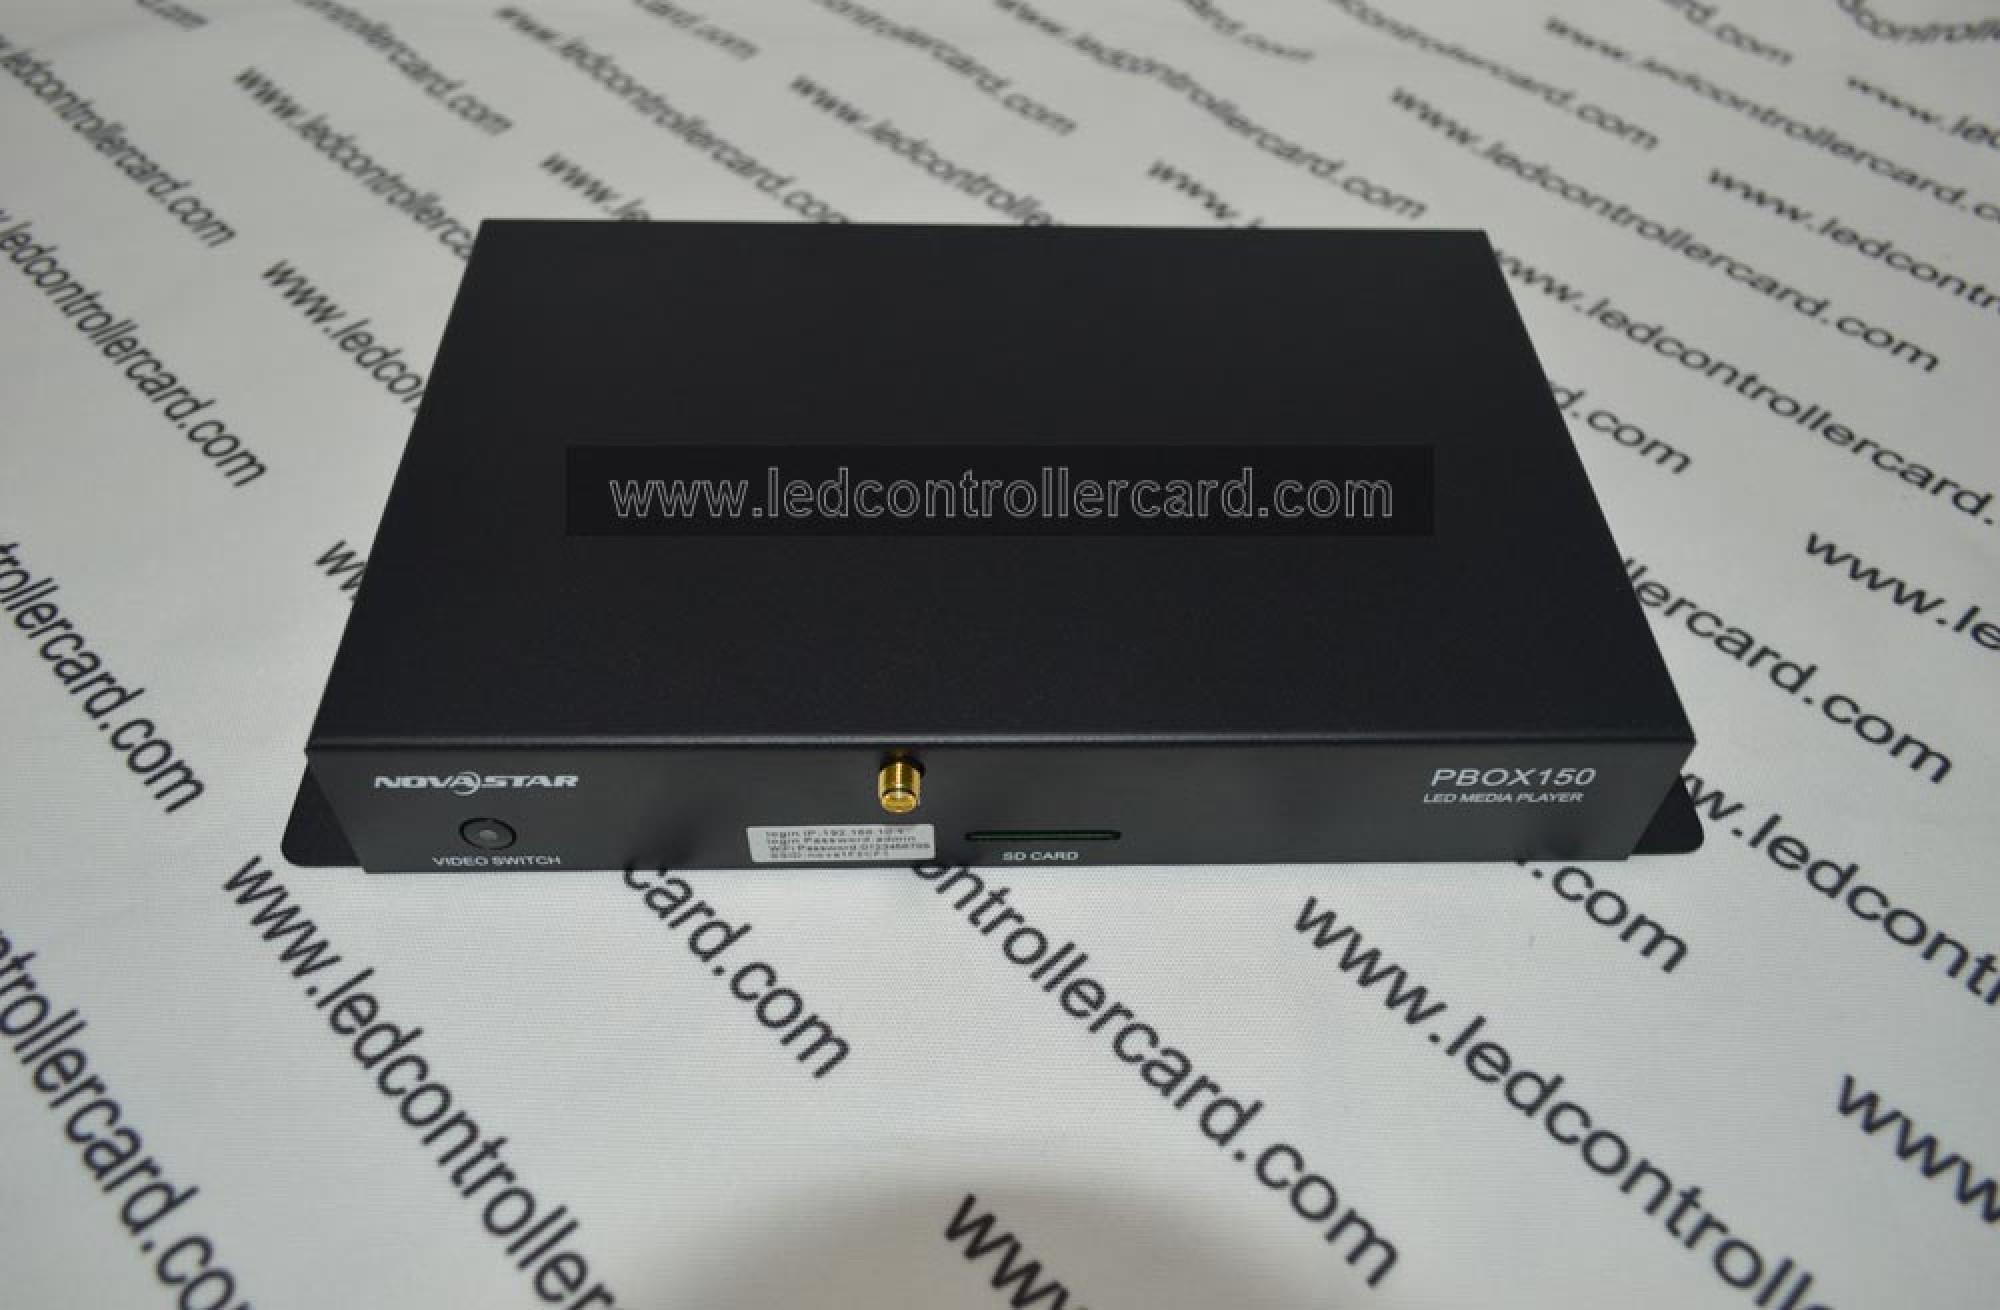 Novastar PBOX150 Dual-Mode LED Display Multimedia Player